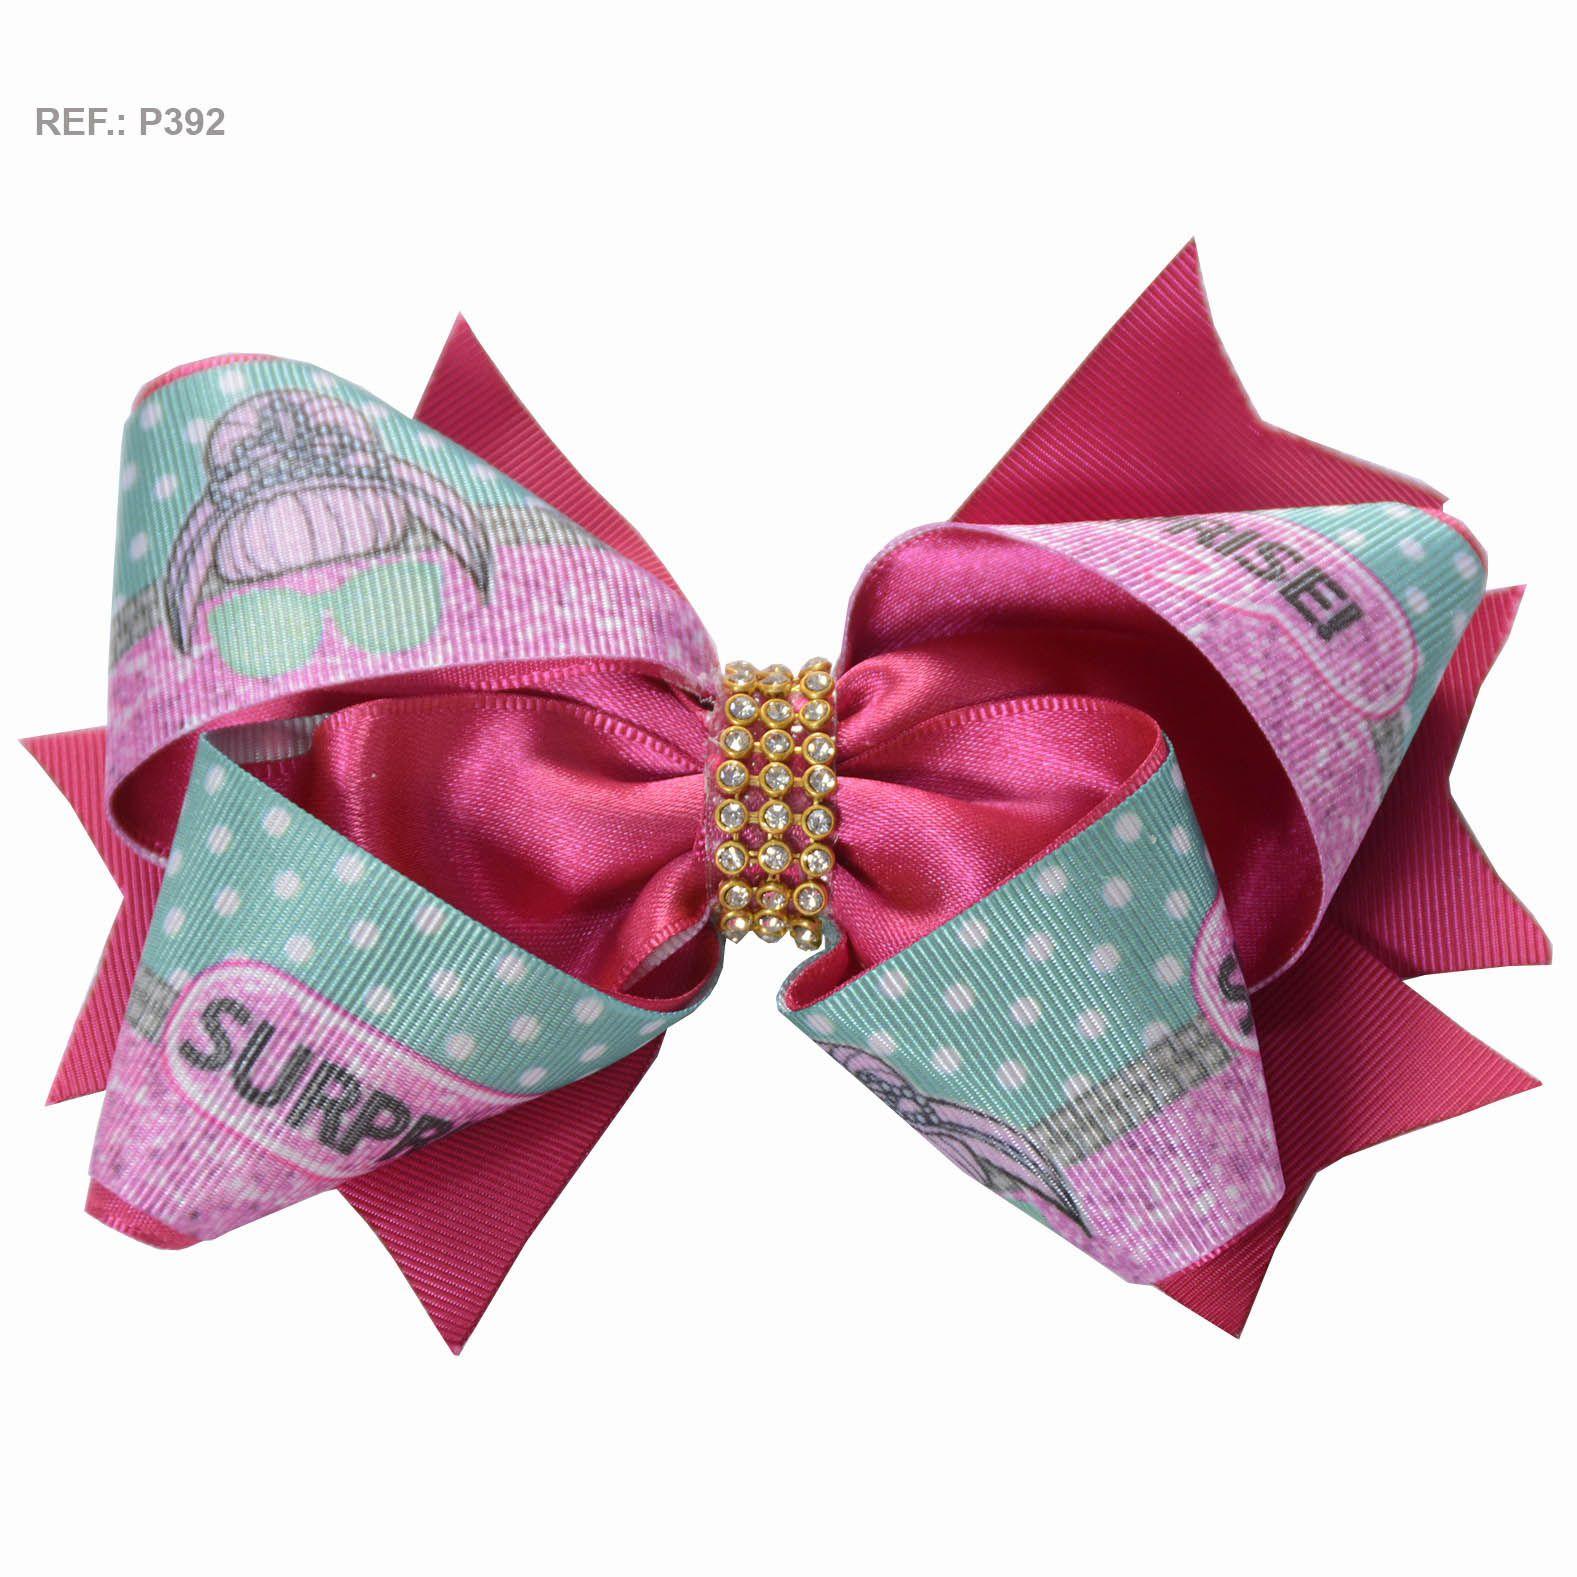 Laço temático da Lol Surprise rosa pink